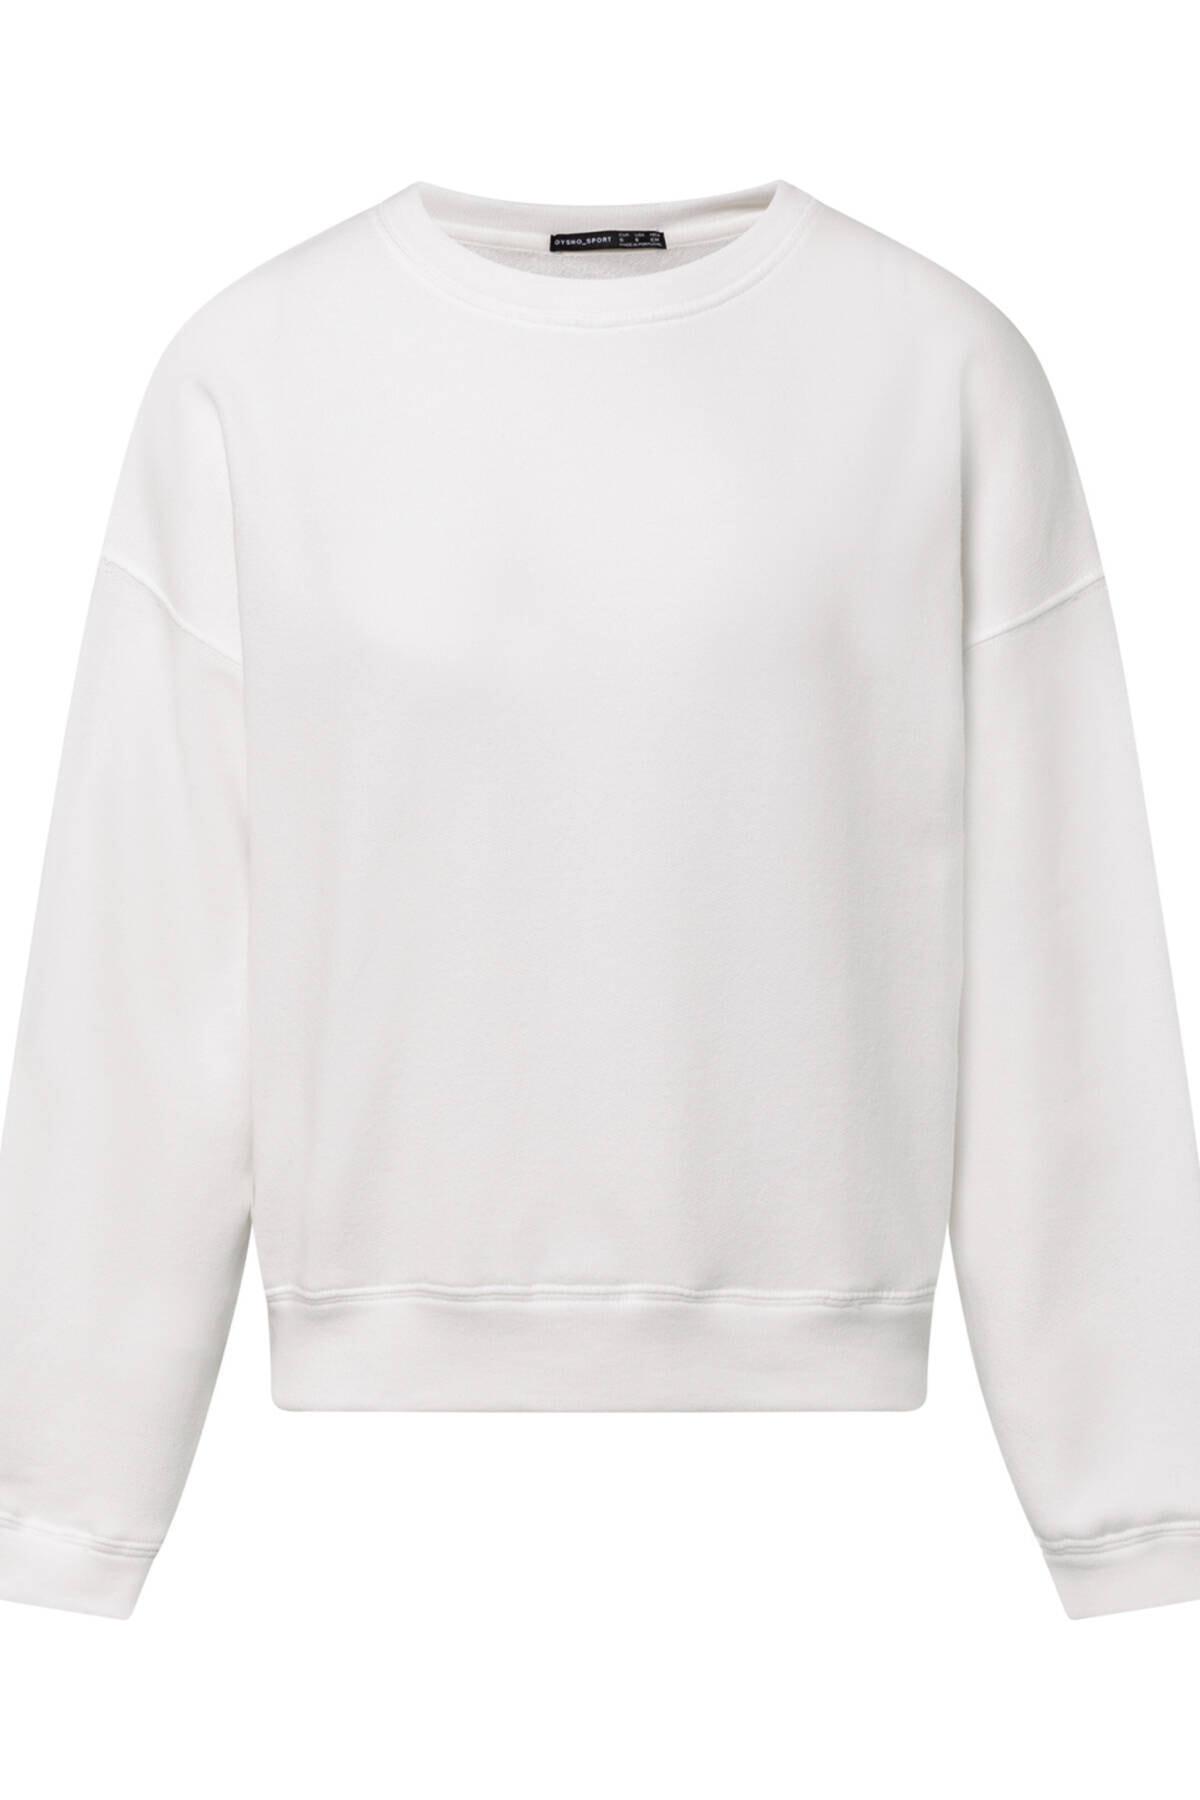 Oysho Kadın Ekru Pamuklu Sweatshirt 3